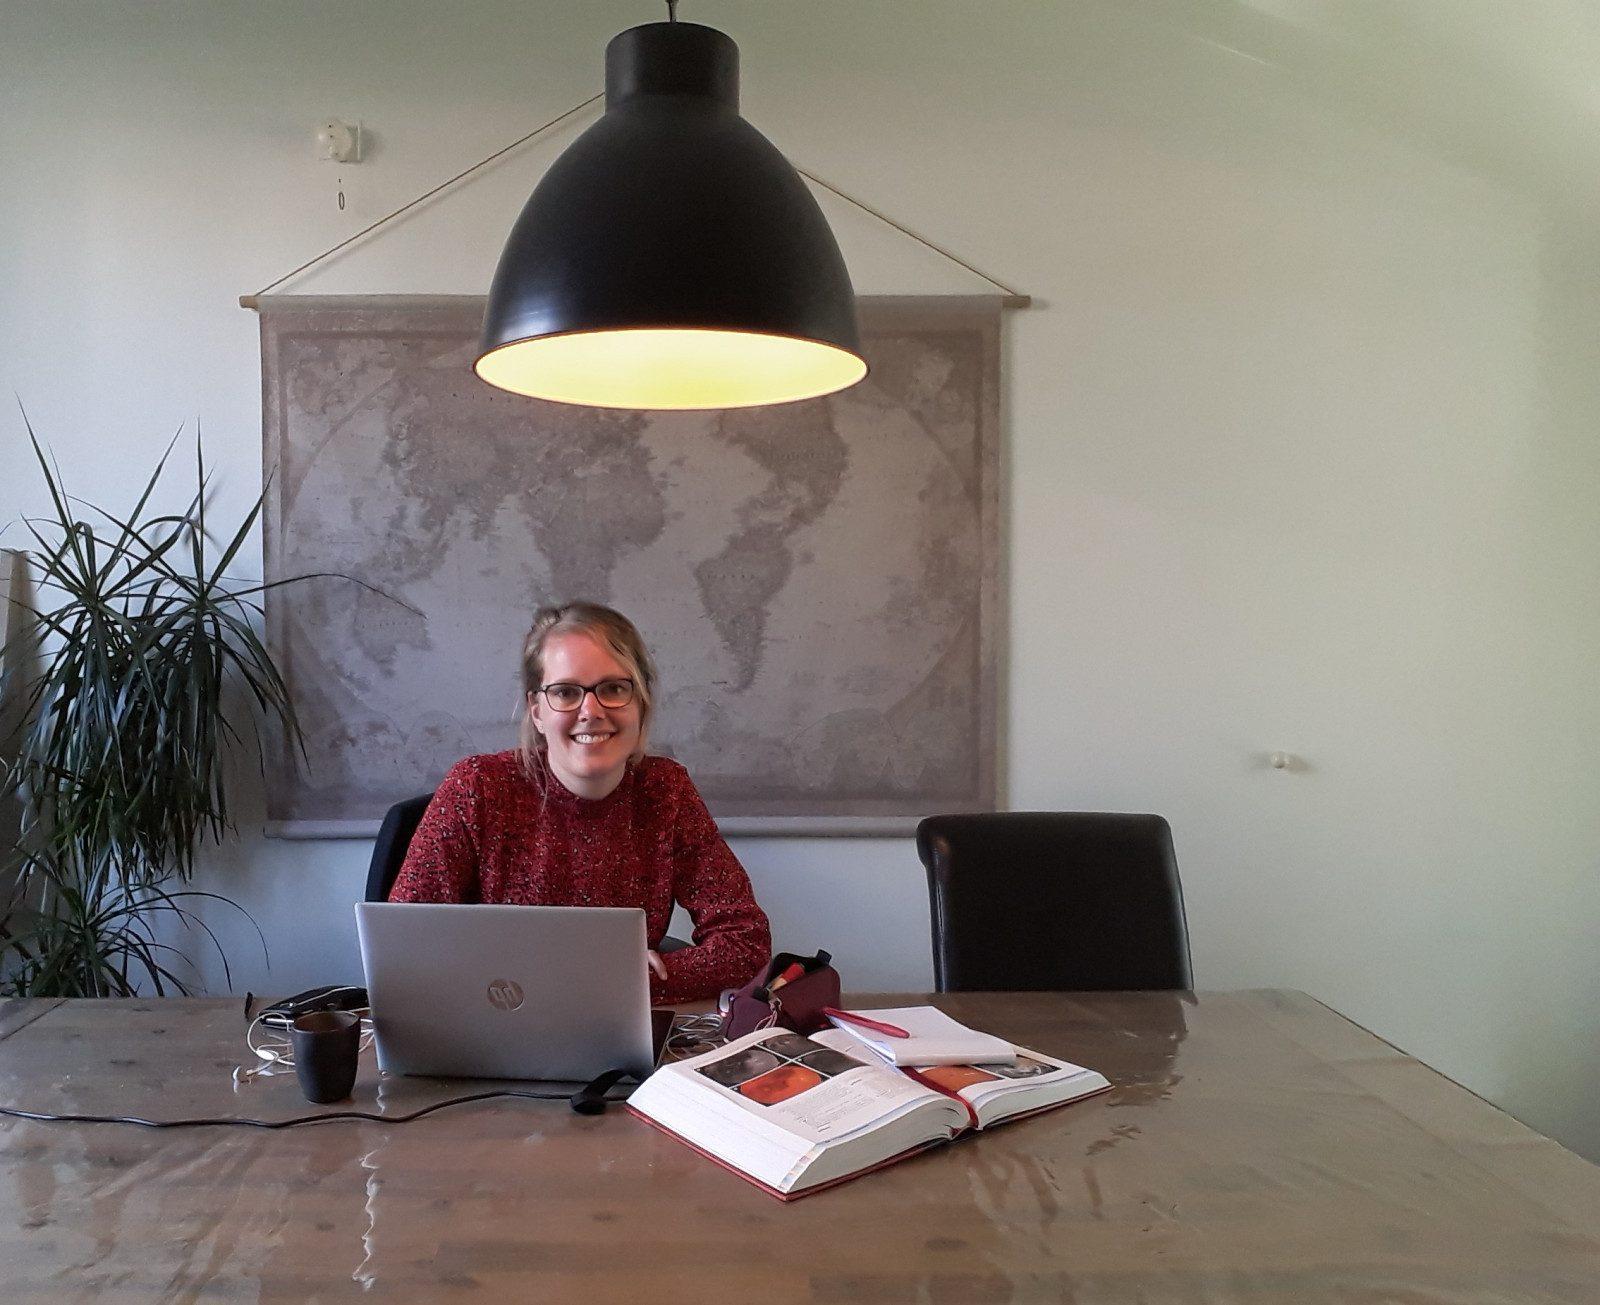 Vakdocent Technisch Oogheelkundig Assistent, Harriette Sietsma